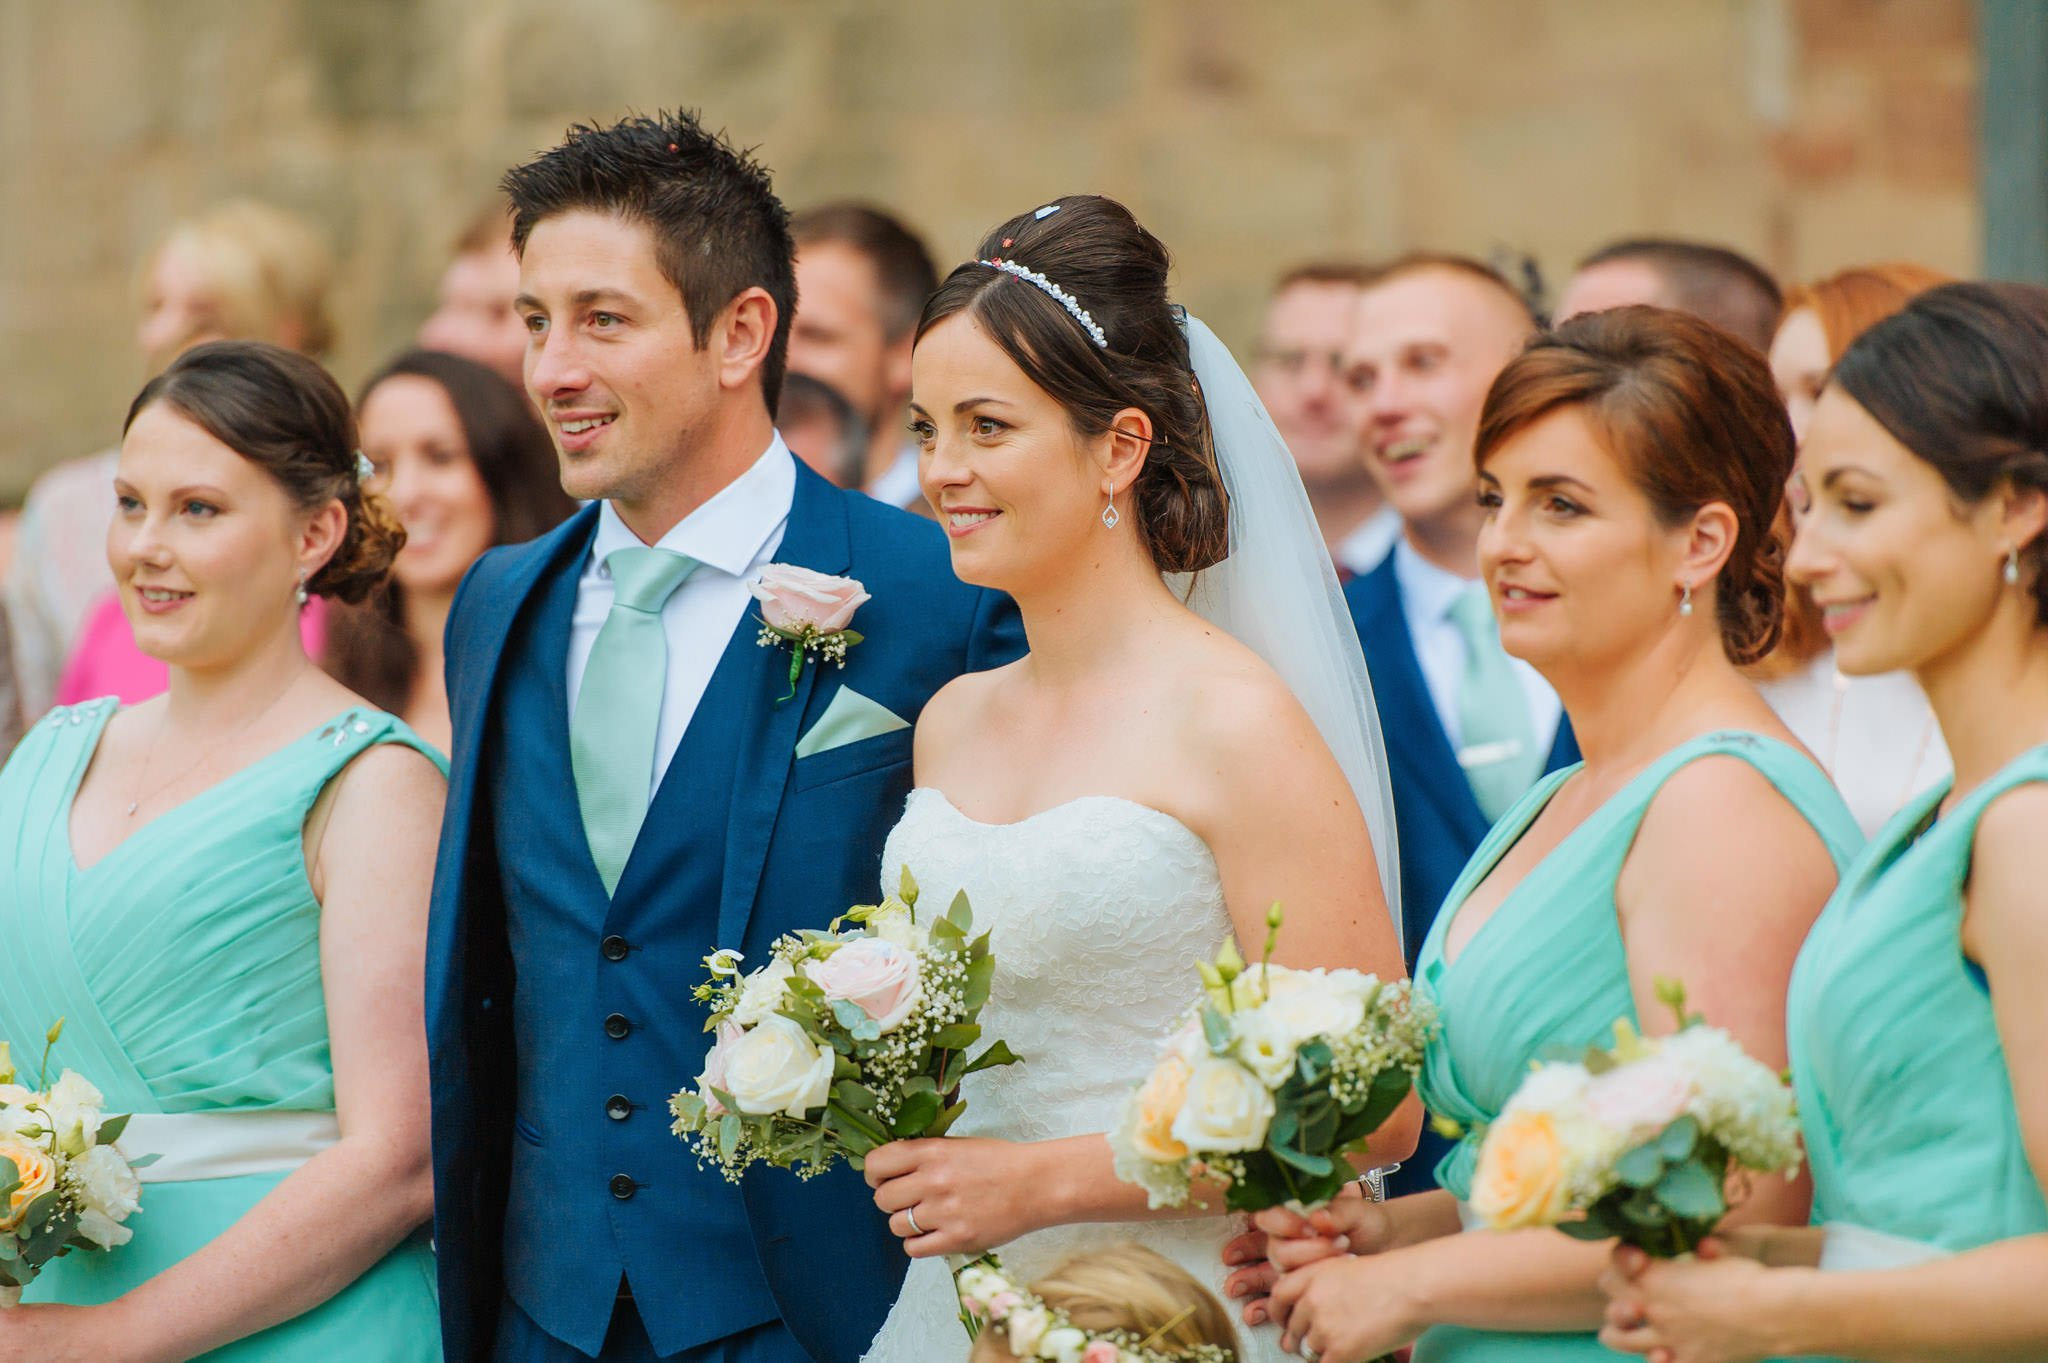 Eastnor Castle wedding photographer Herefordshire, West Midlands - Sarah + Dean 37